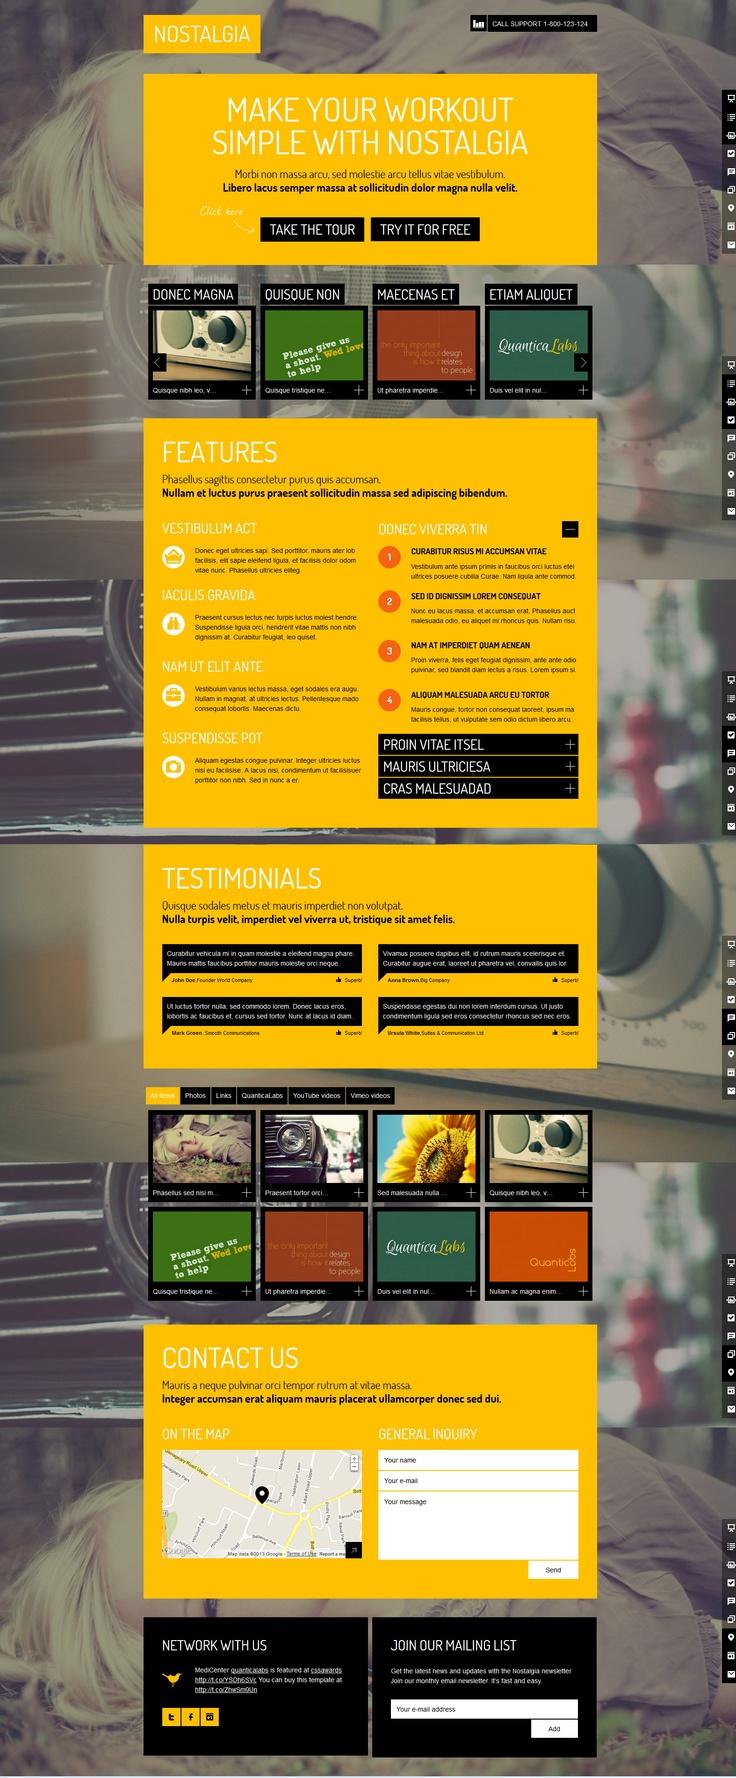 Nostalgia  |  Responsive, Slideshow Background, One-Page, Wordpress Template  |  themeforest  |  http://quanticalabs.com/wp_themes/nostalgialanding/#